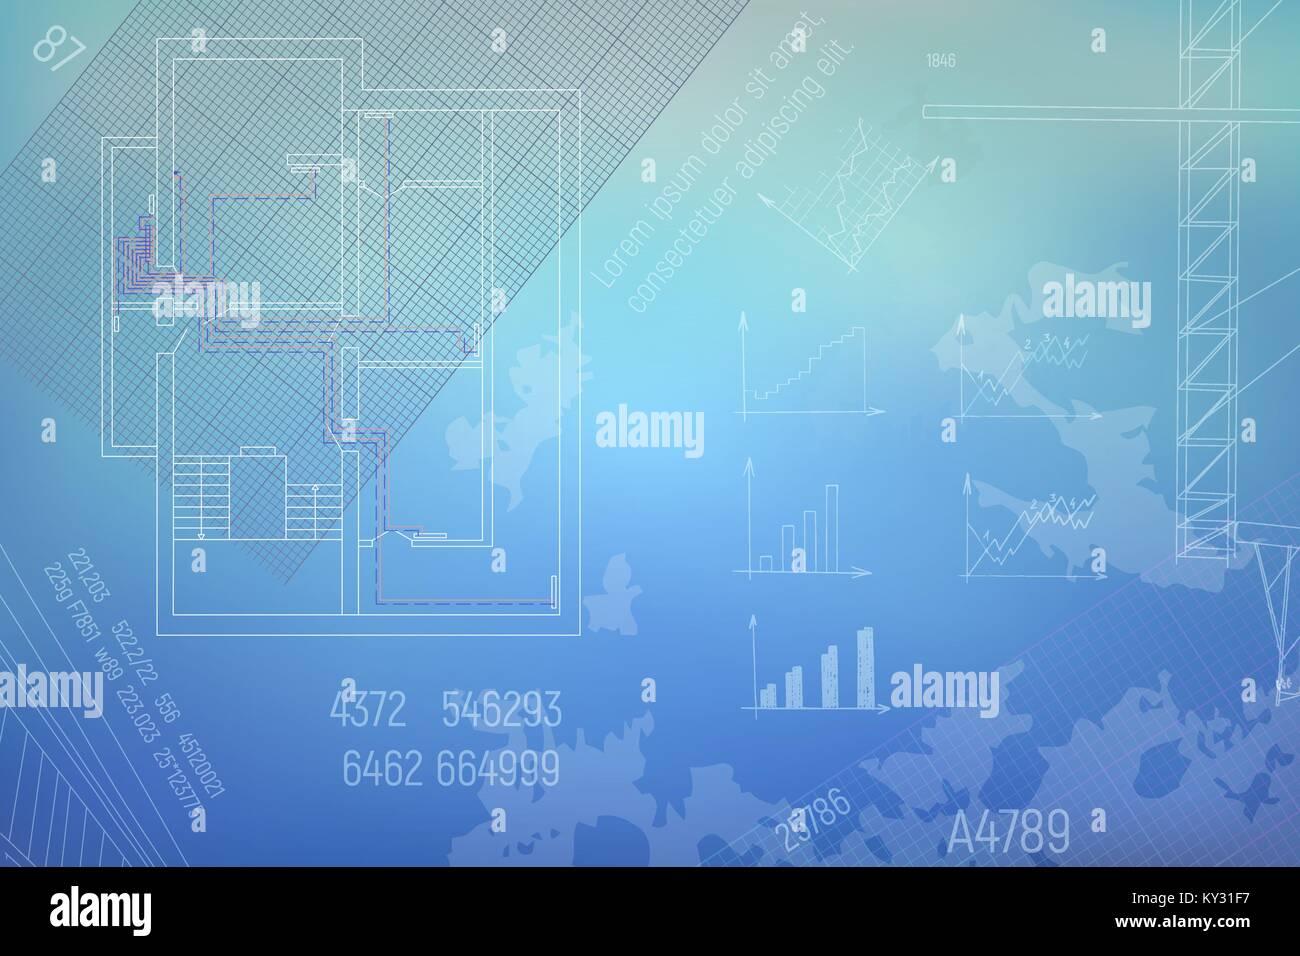 Hvac Engineering Drawing Stock Vector Art Illustration Design And